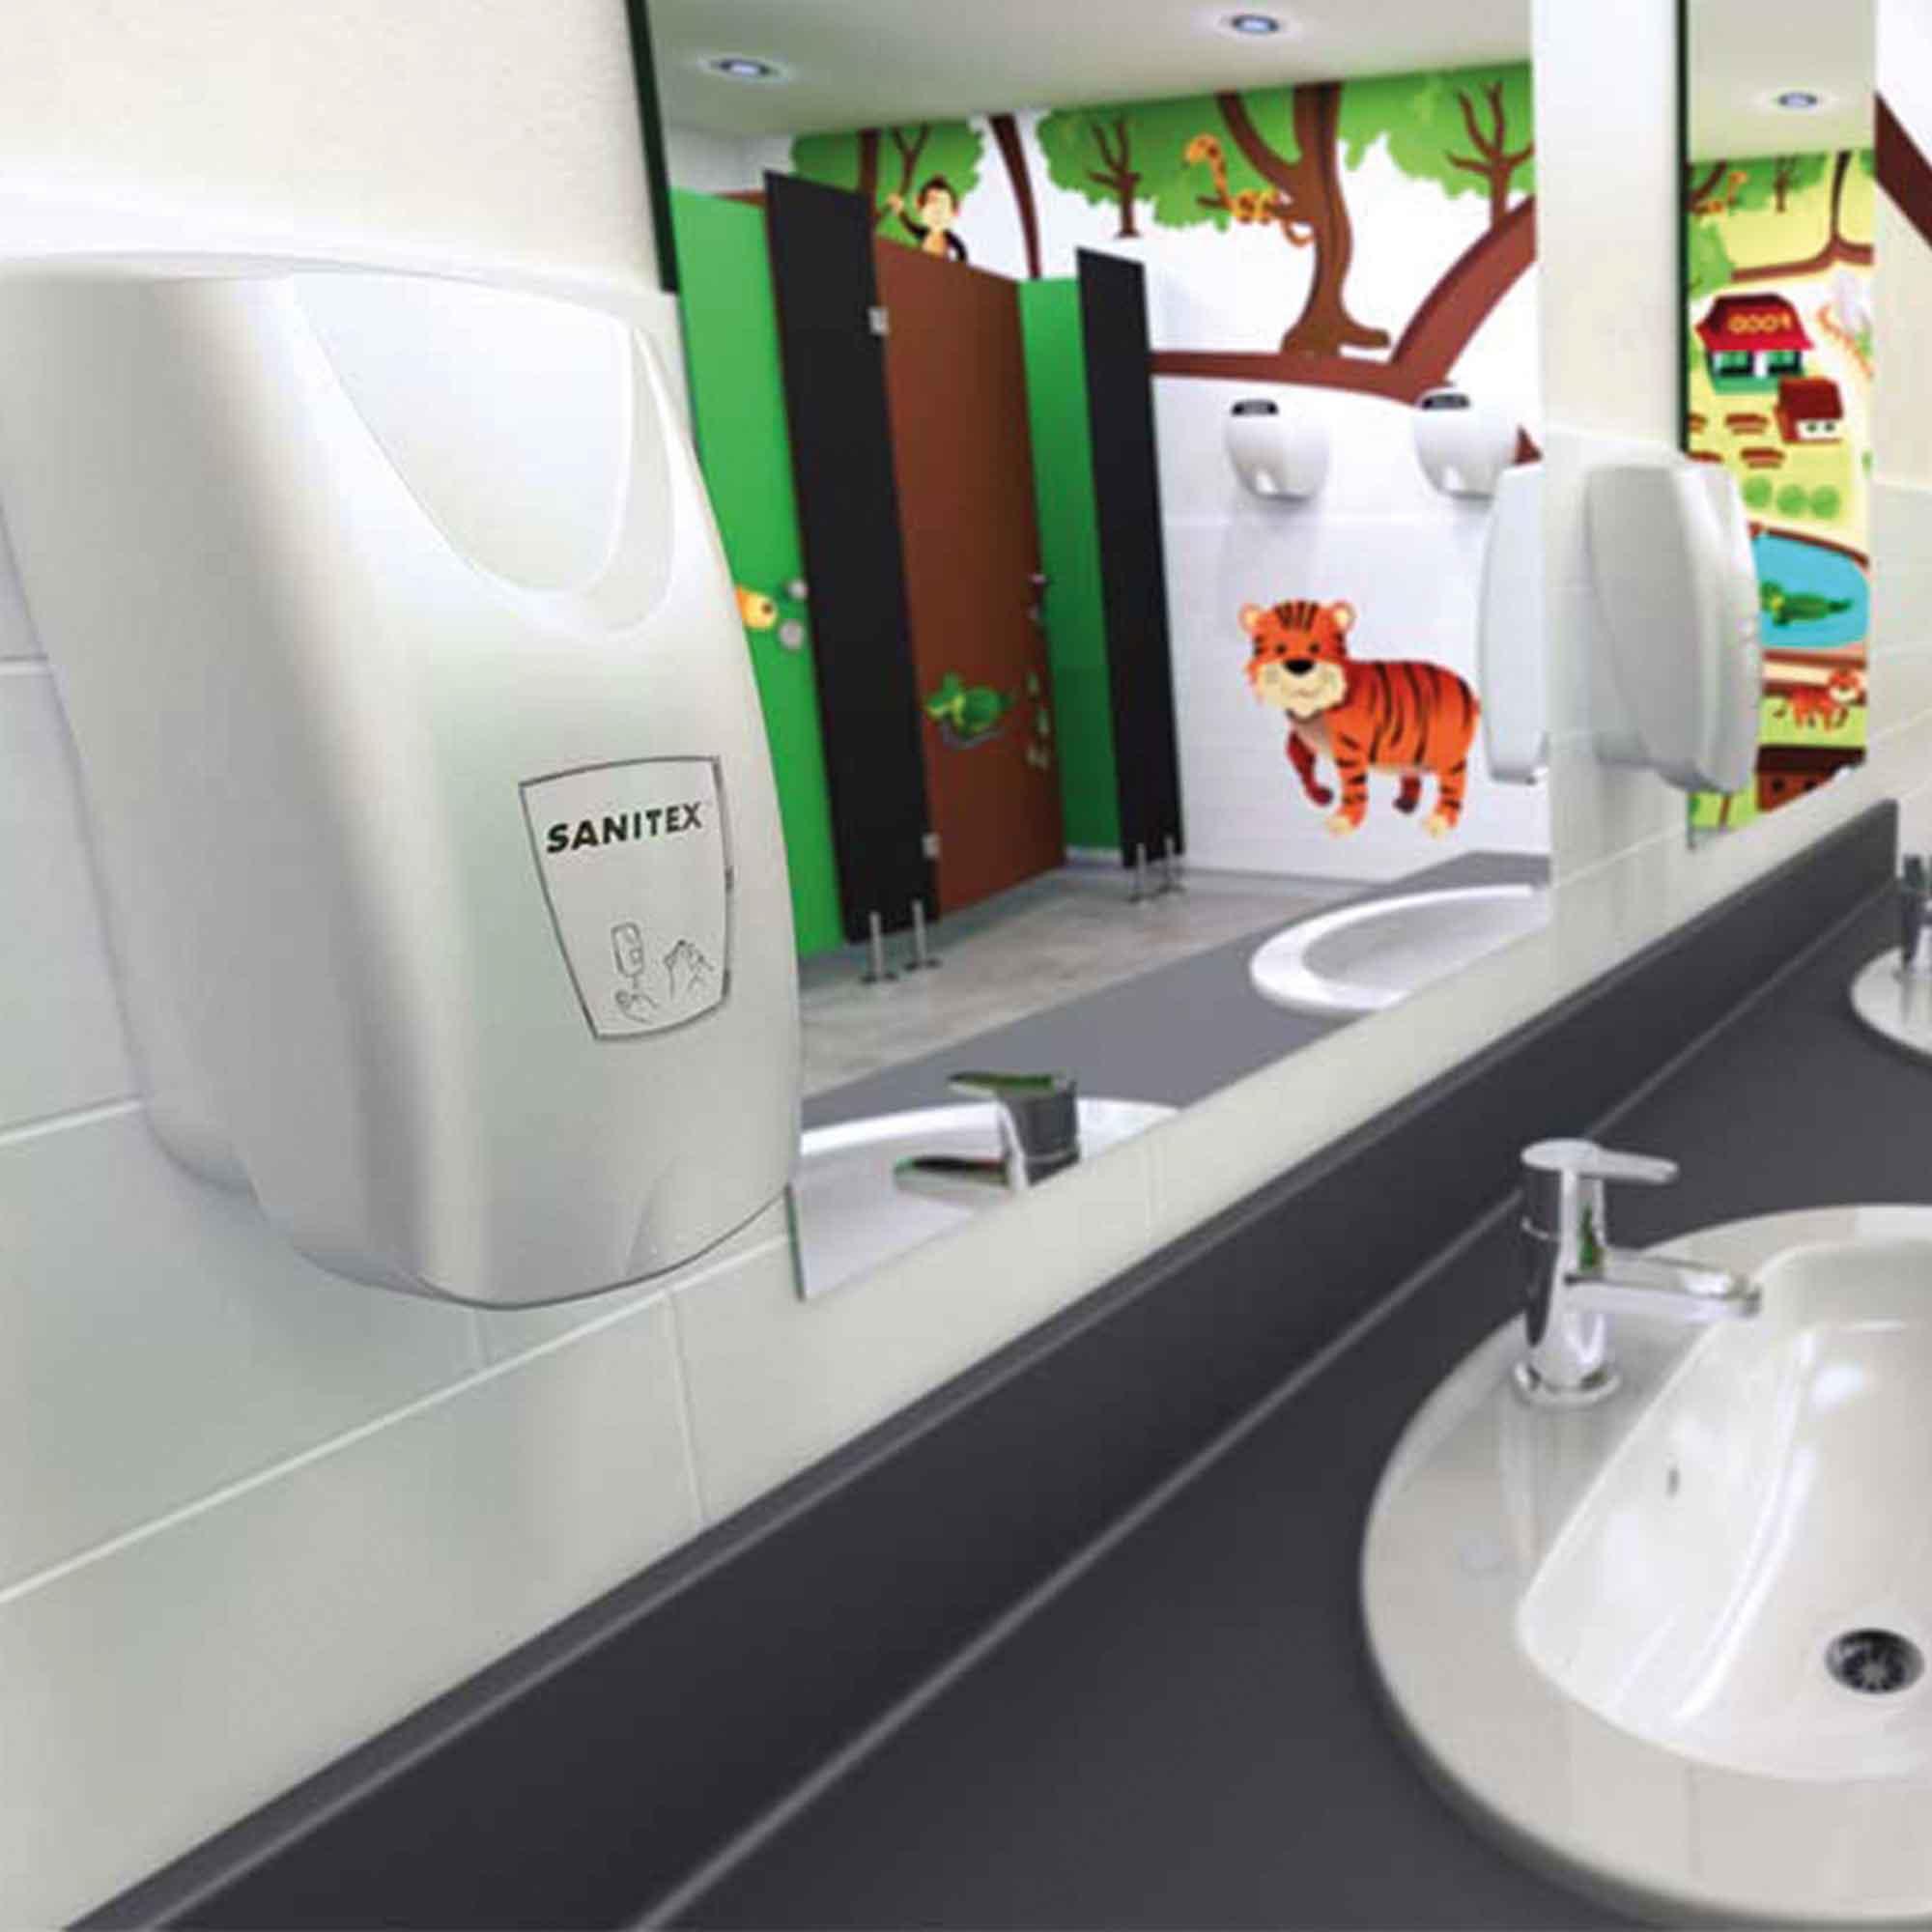 Sanitex Dispenser - Soaps